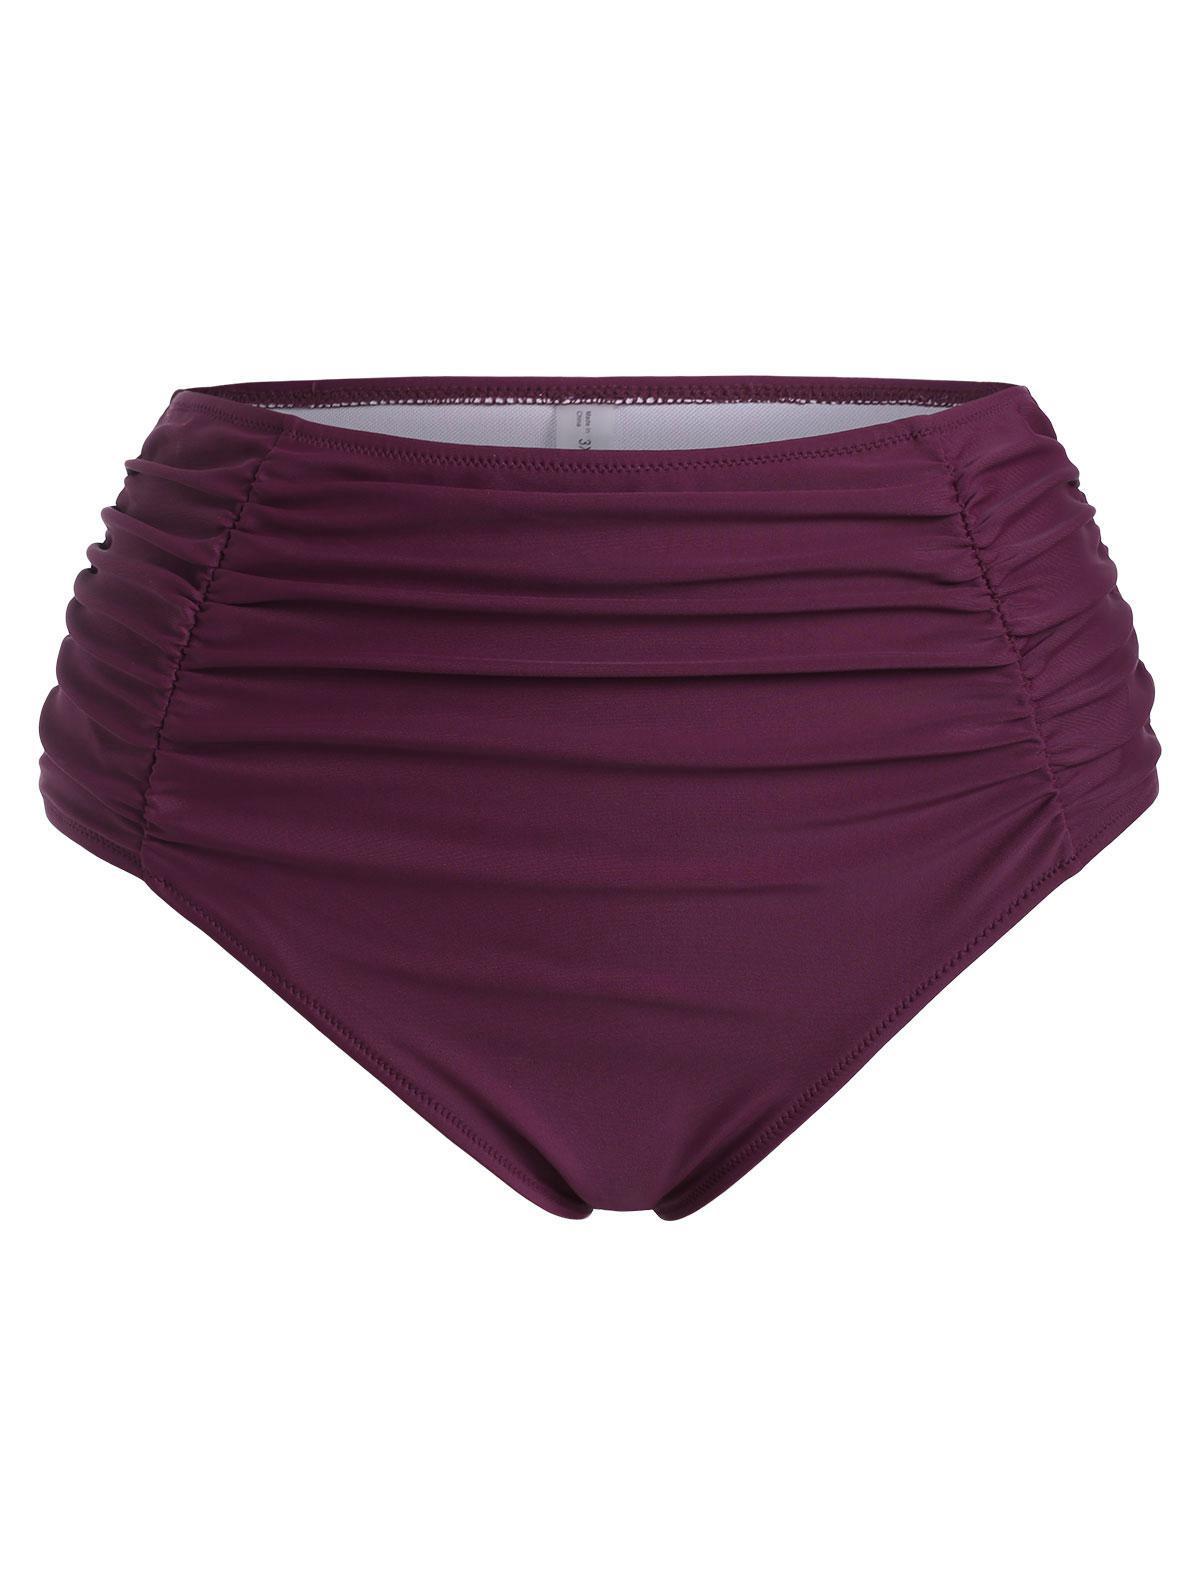 ZAFUL Plus Size Ruched High Rise Bikini Bottom